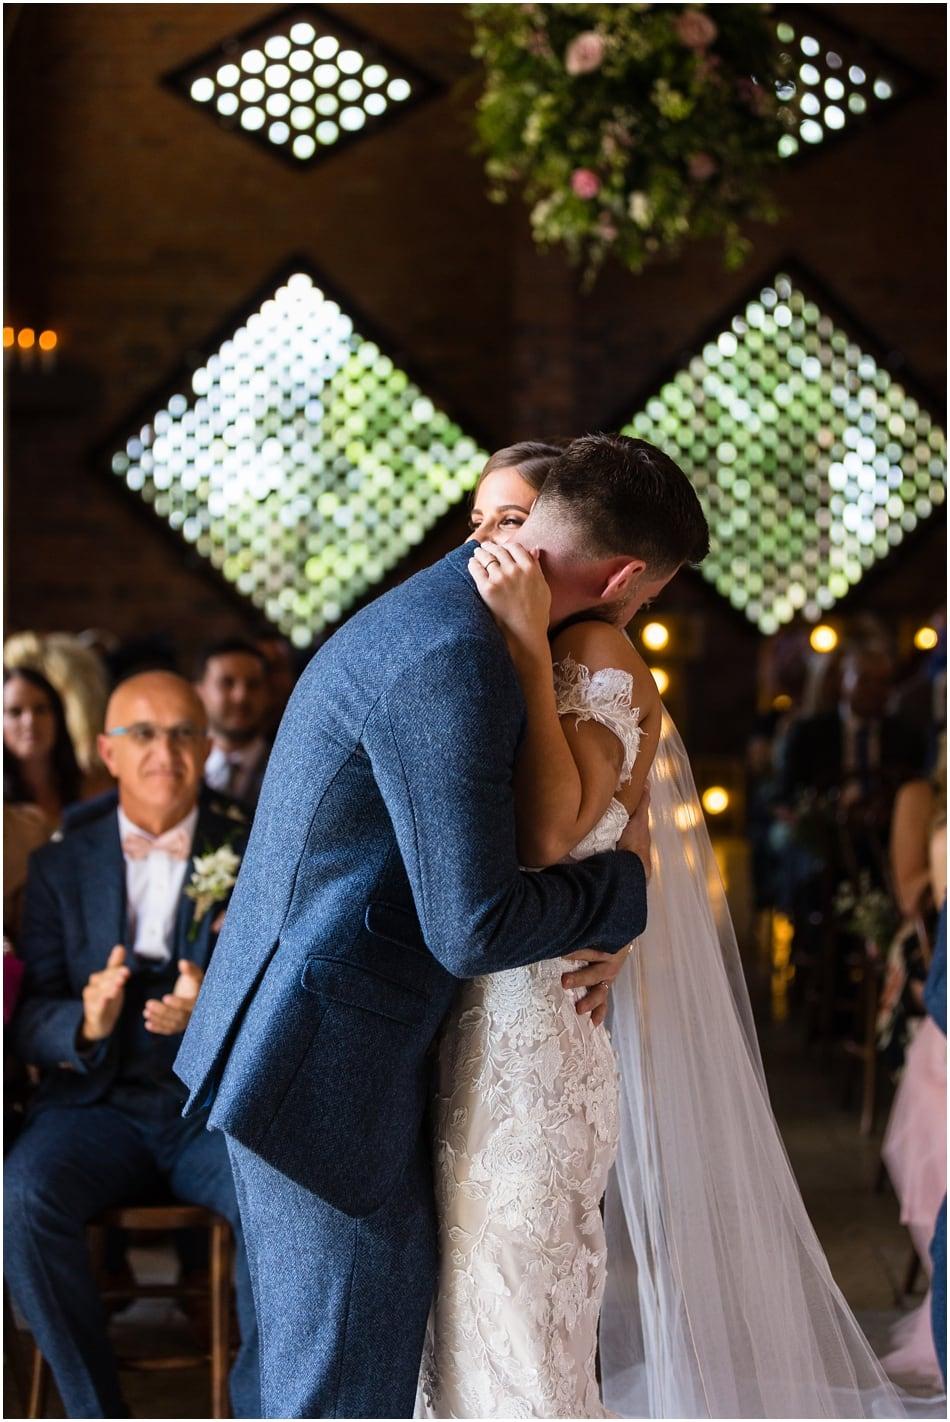 Bride & Groom just married in civil ceremony at Shustoke Barn wedding